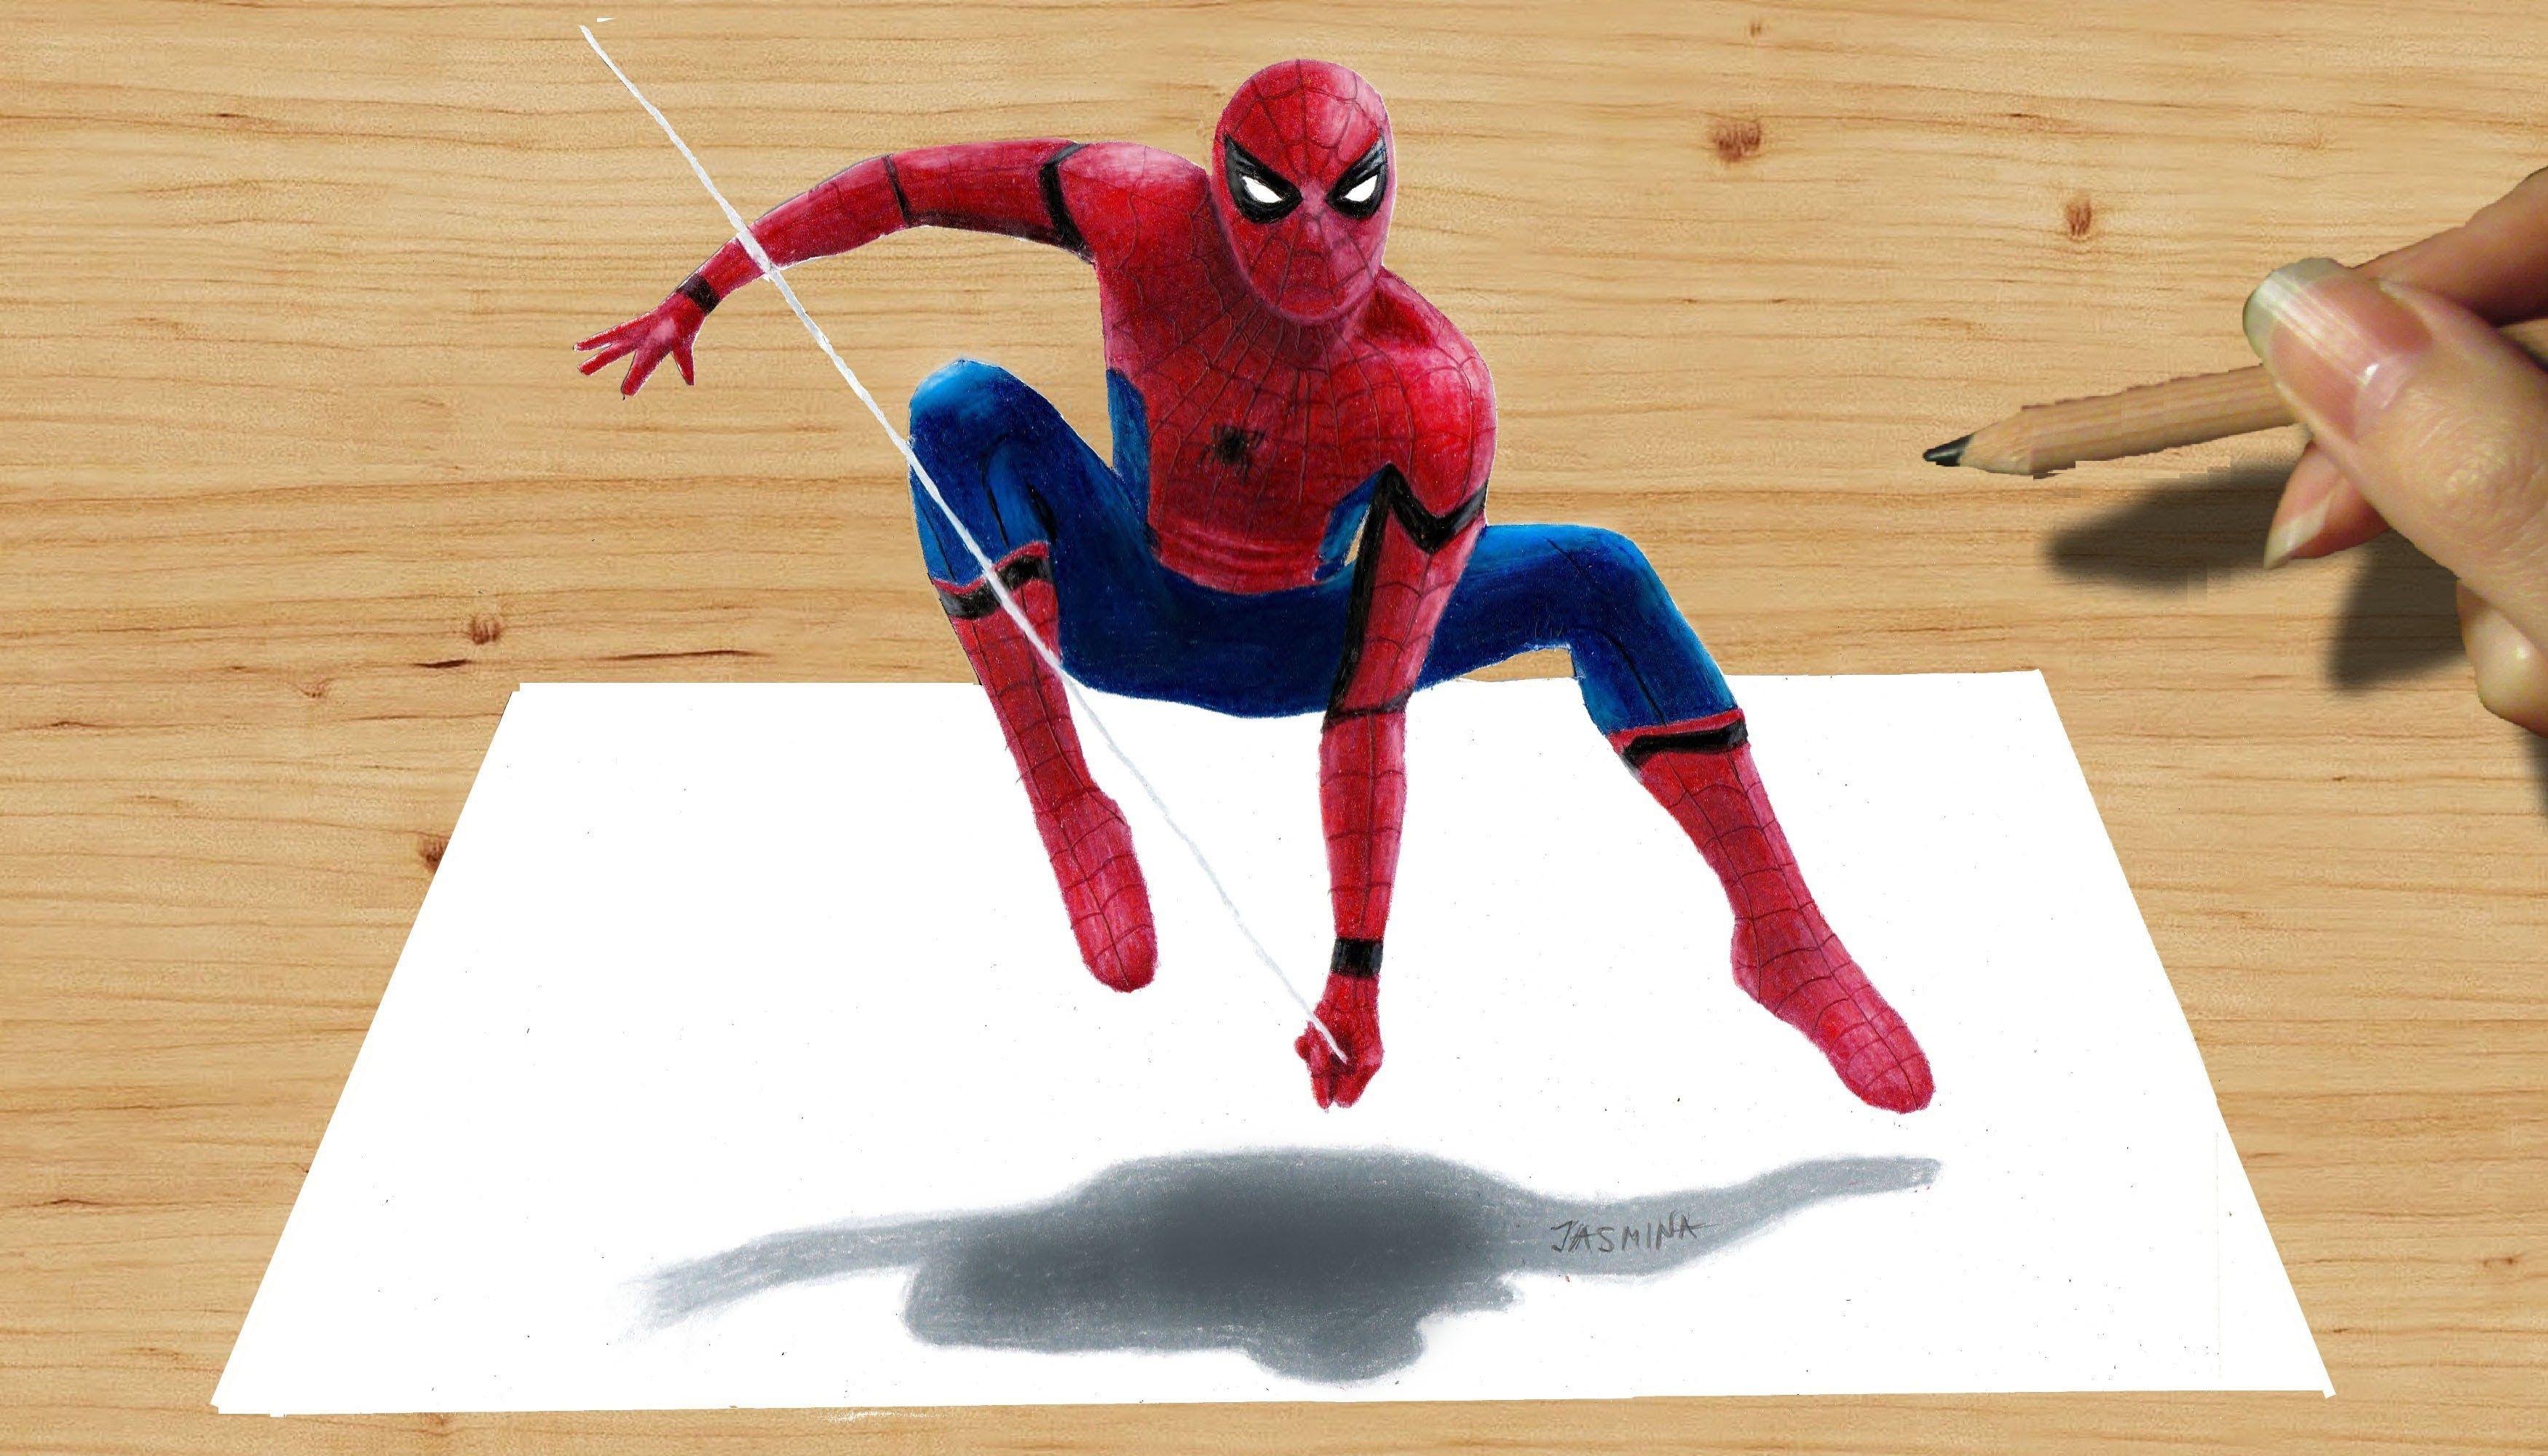 3d Pencil Drawing Spider Man New Costume In Captain America Civil War Spiderman Drawing 3d Pencil Drawings 3d Drawings